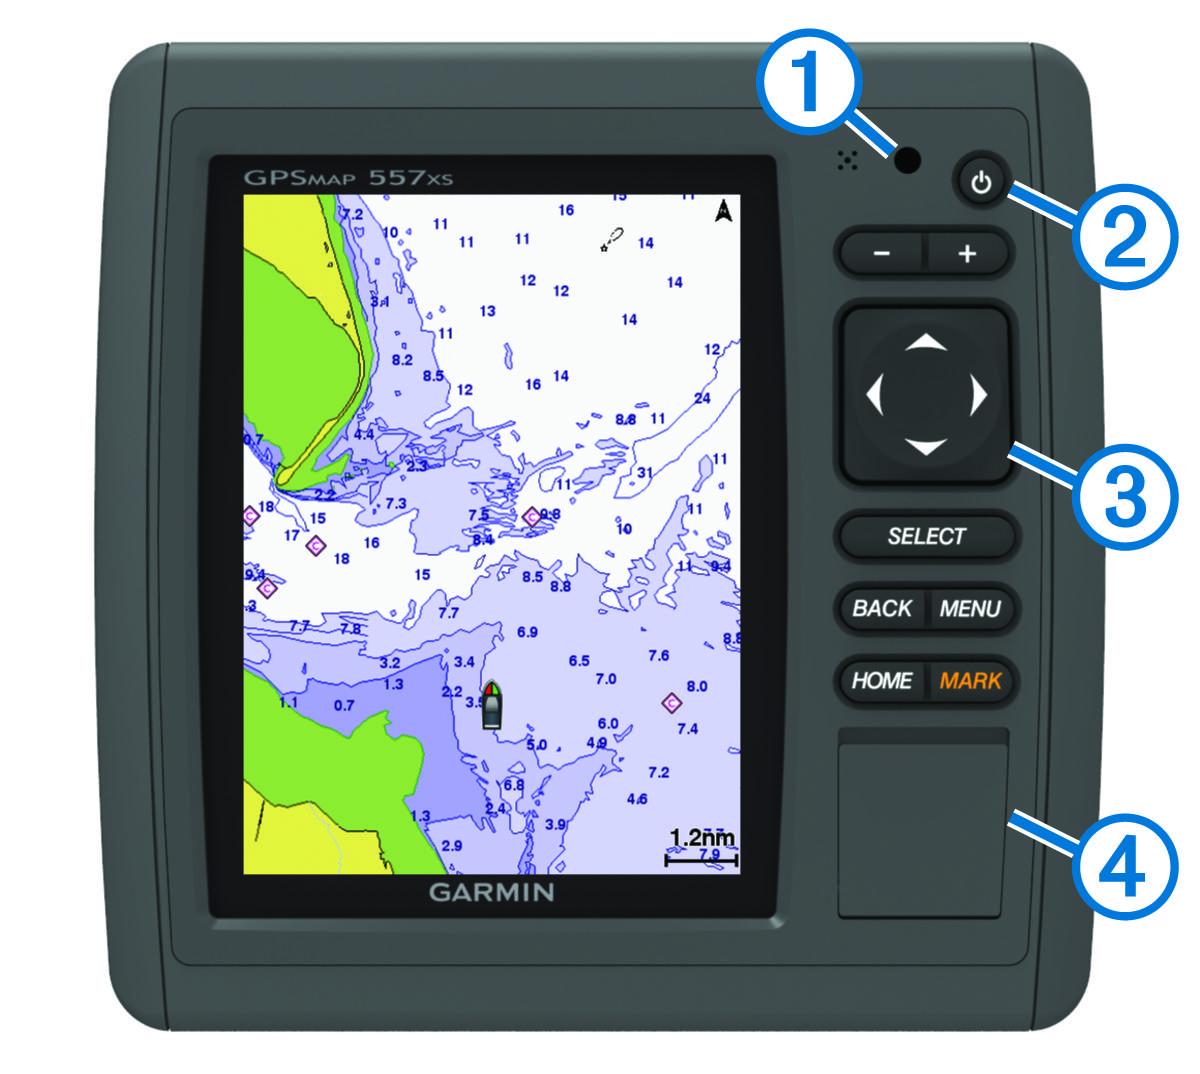 gpsmap 500 700 series and echomap 50 70 series echomap 50 series rh www8 garmin com garmin gpsmap 700 series owner's manual garmin gpsmap 700 series owner's manual